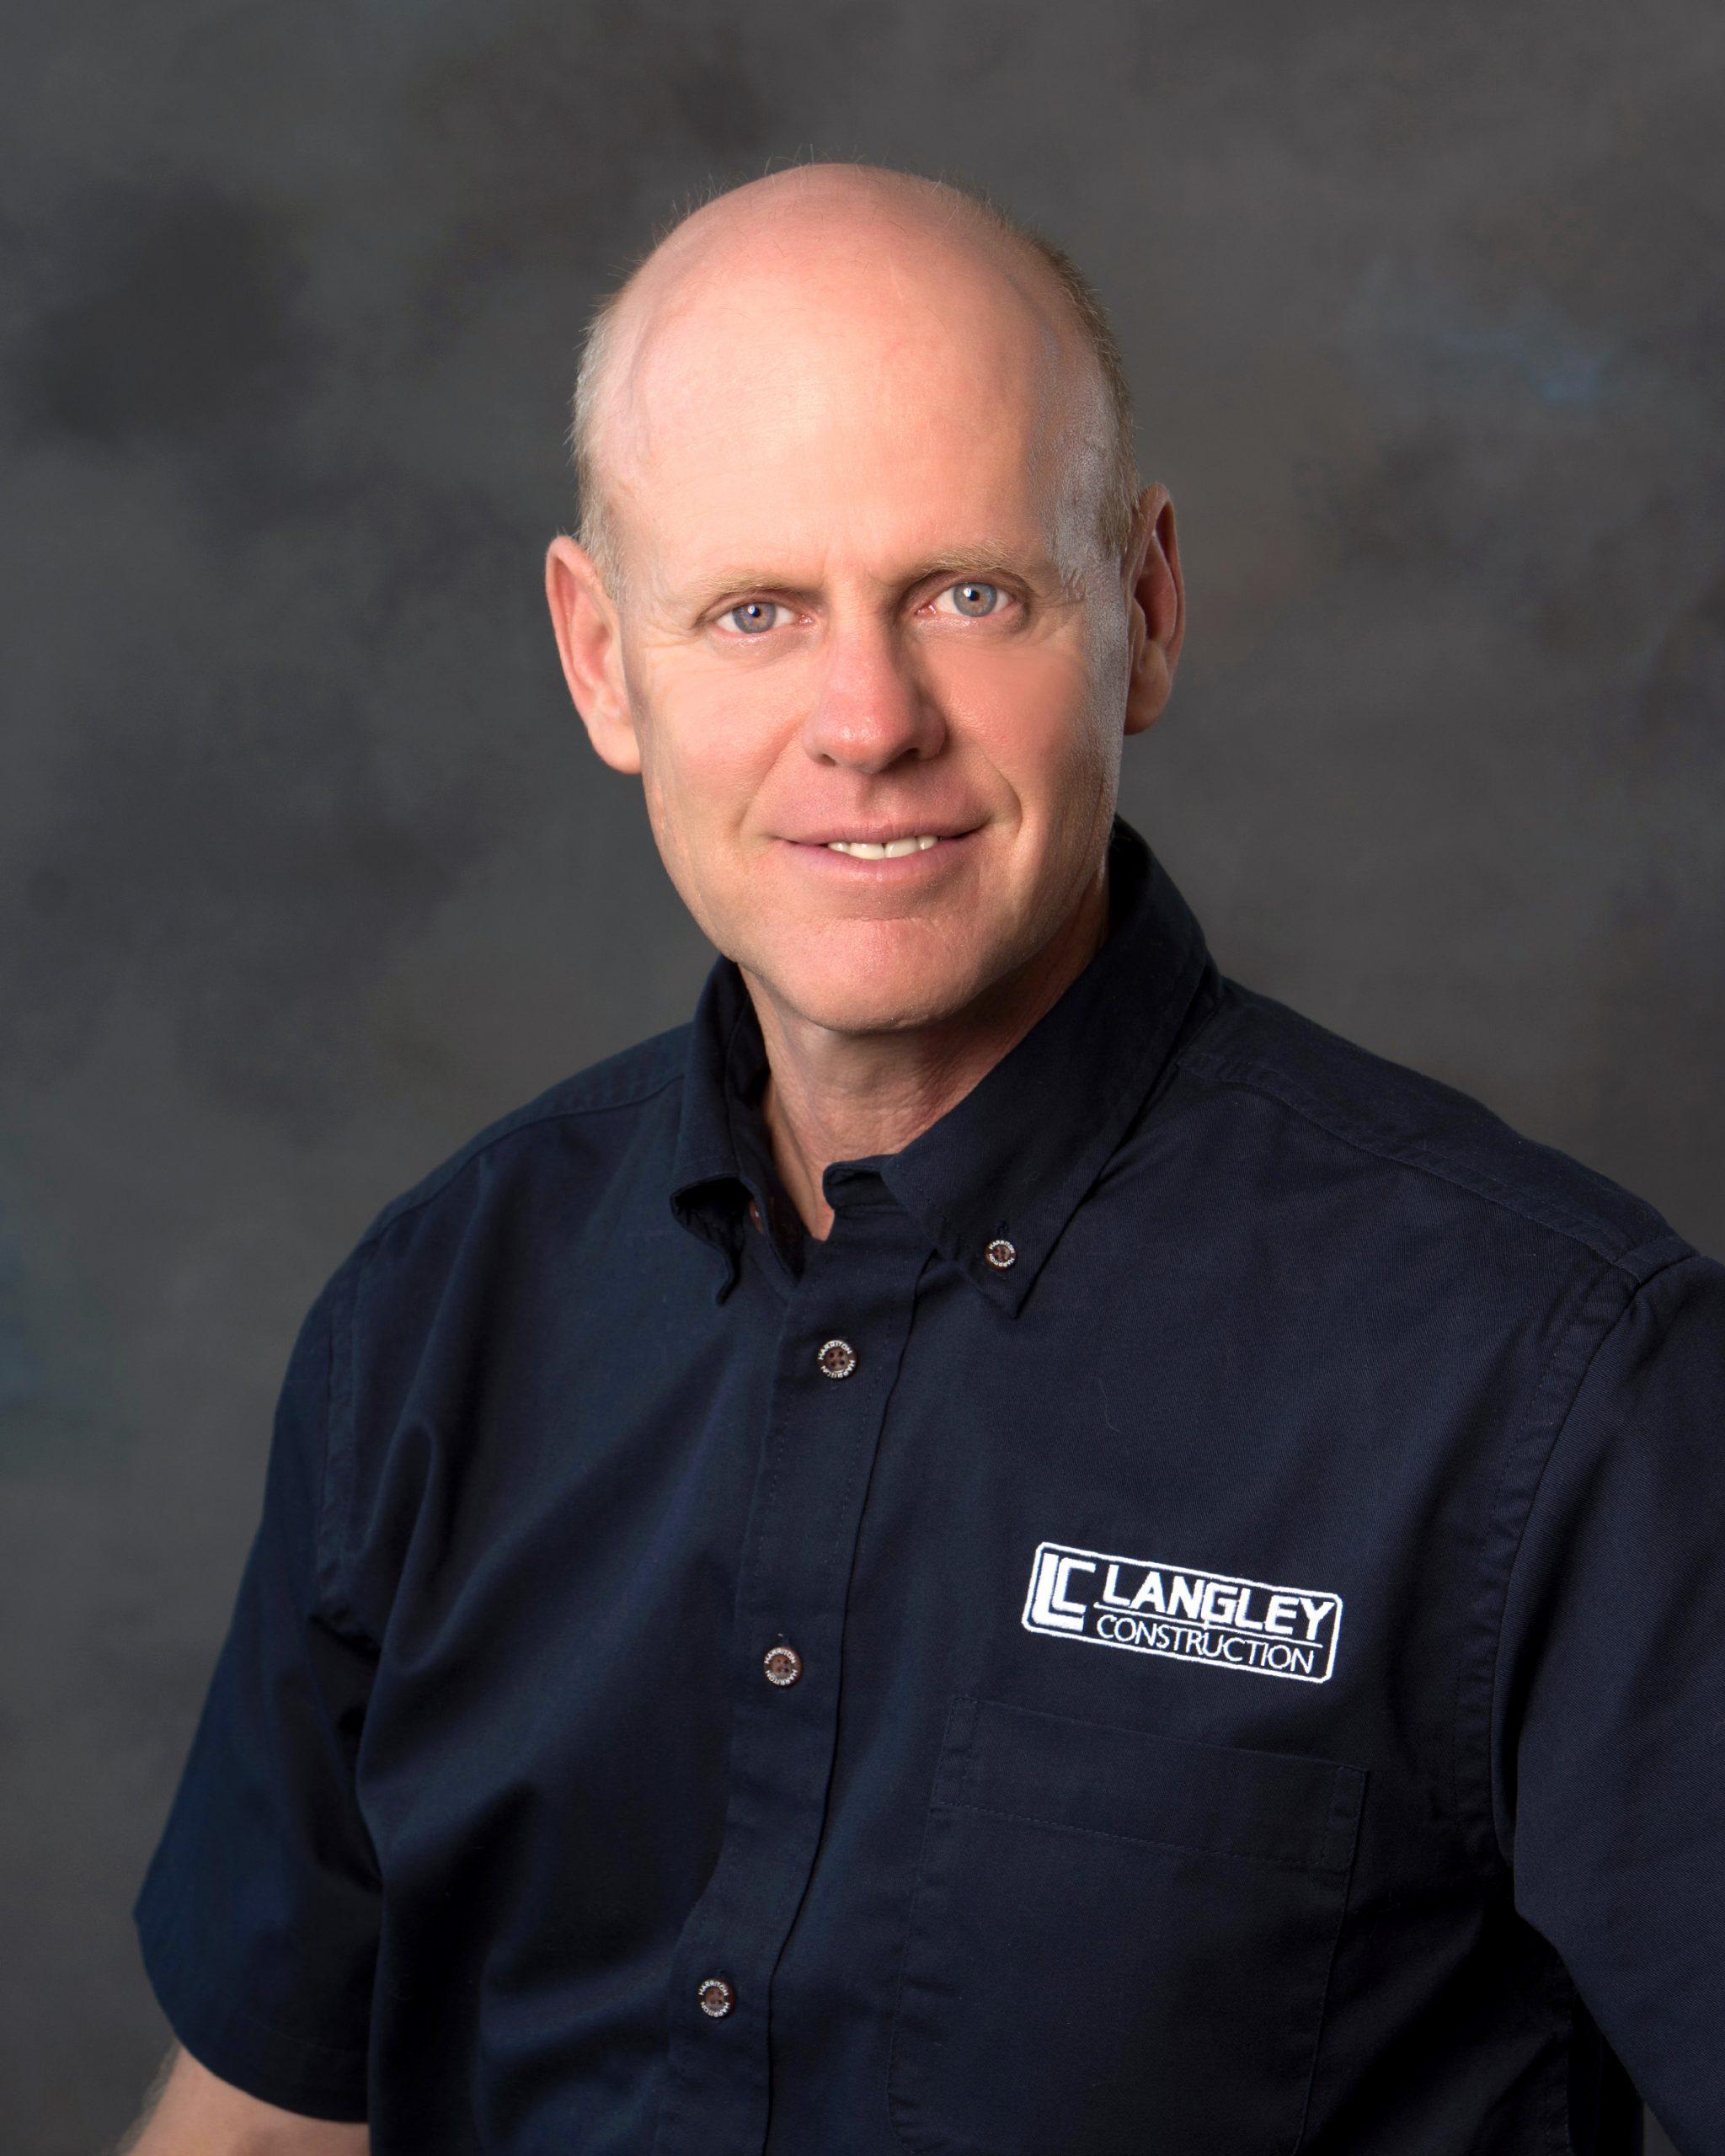 Stephen J. Langley